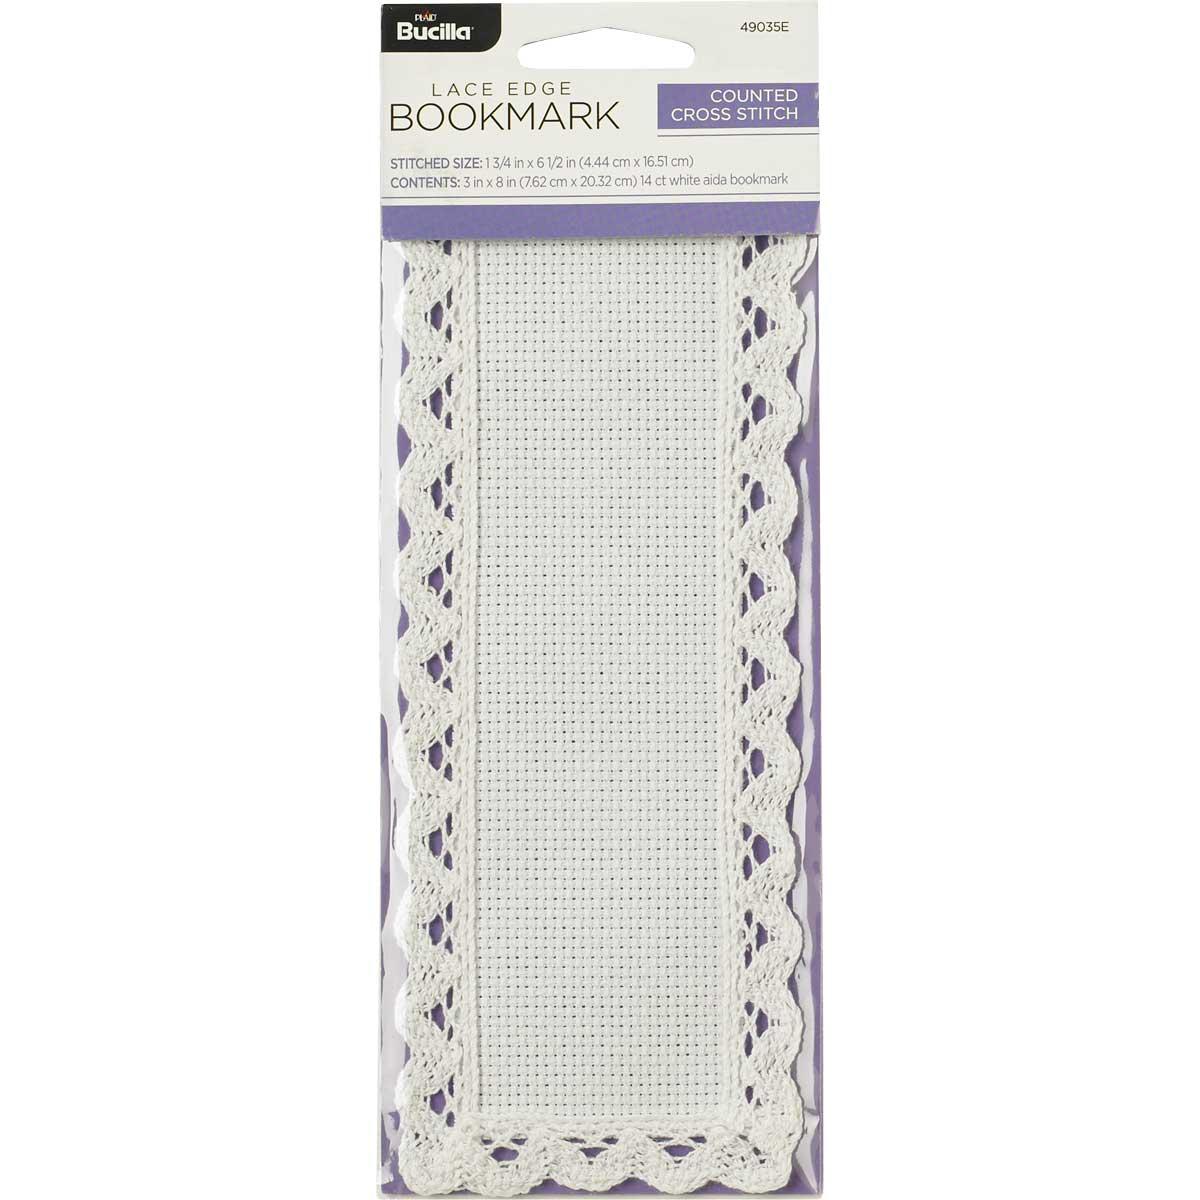 Bucilla ® Ready to Stitch™ Blanks - Lace Edge Bookmark, 1-3/4